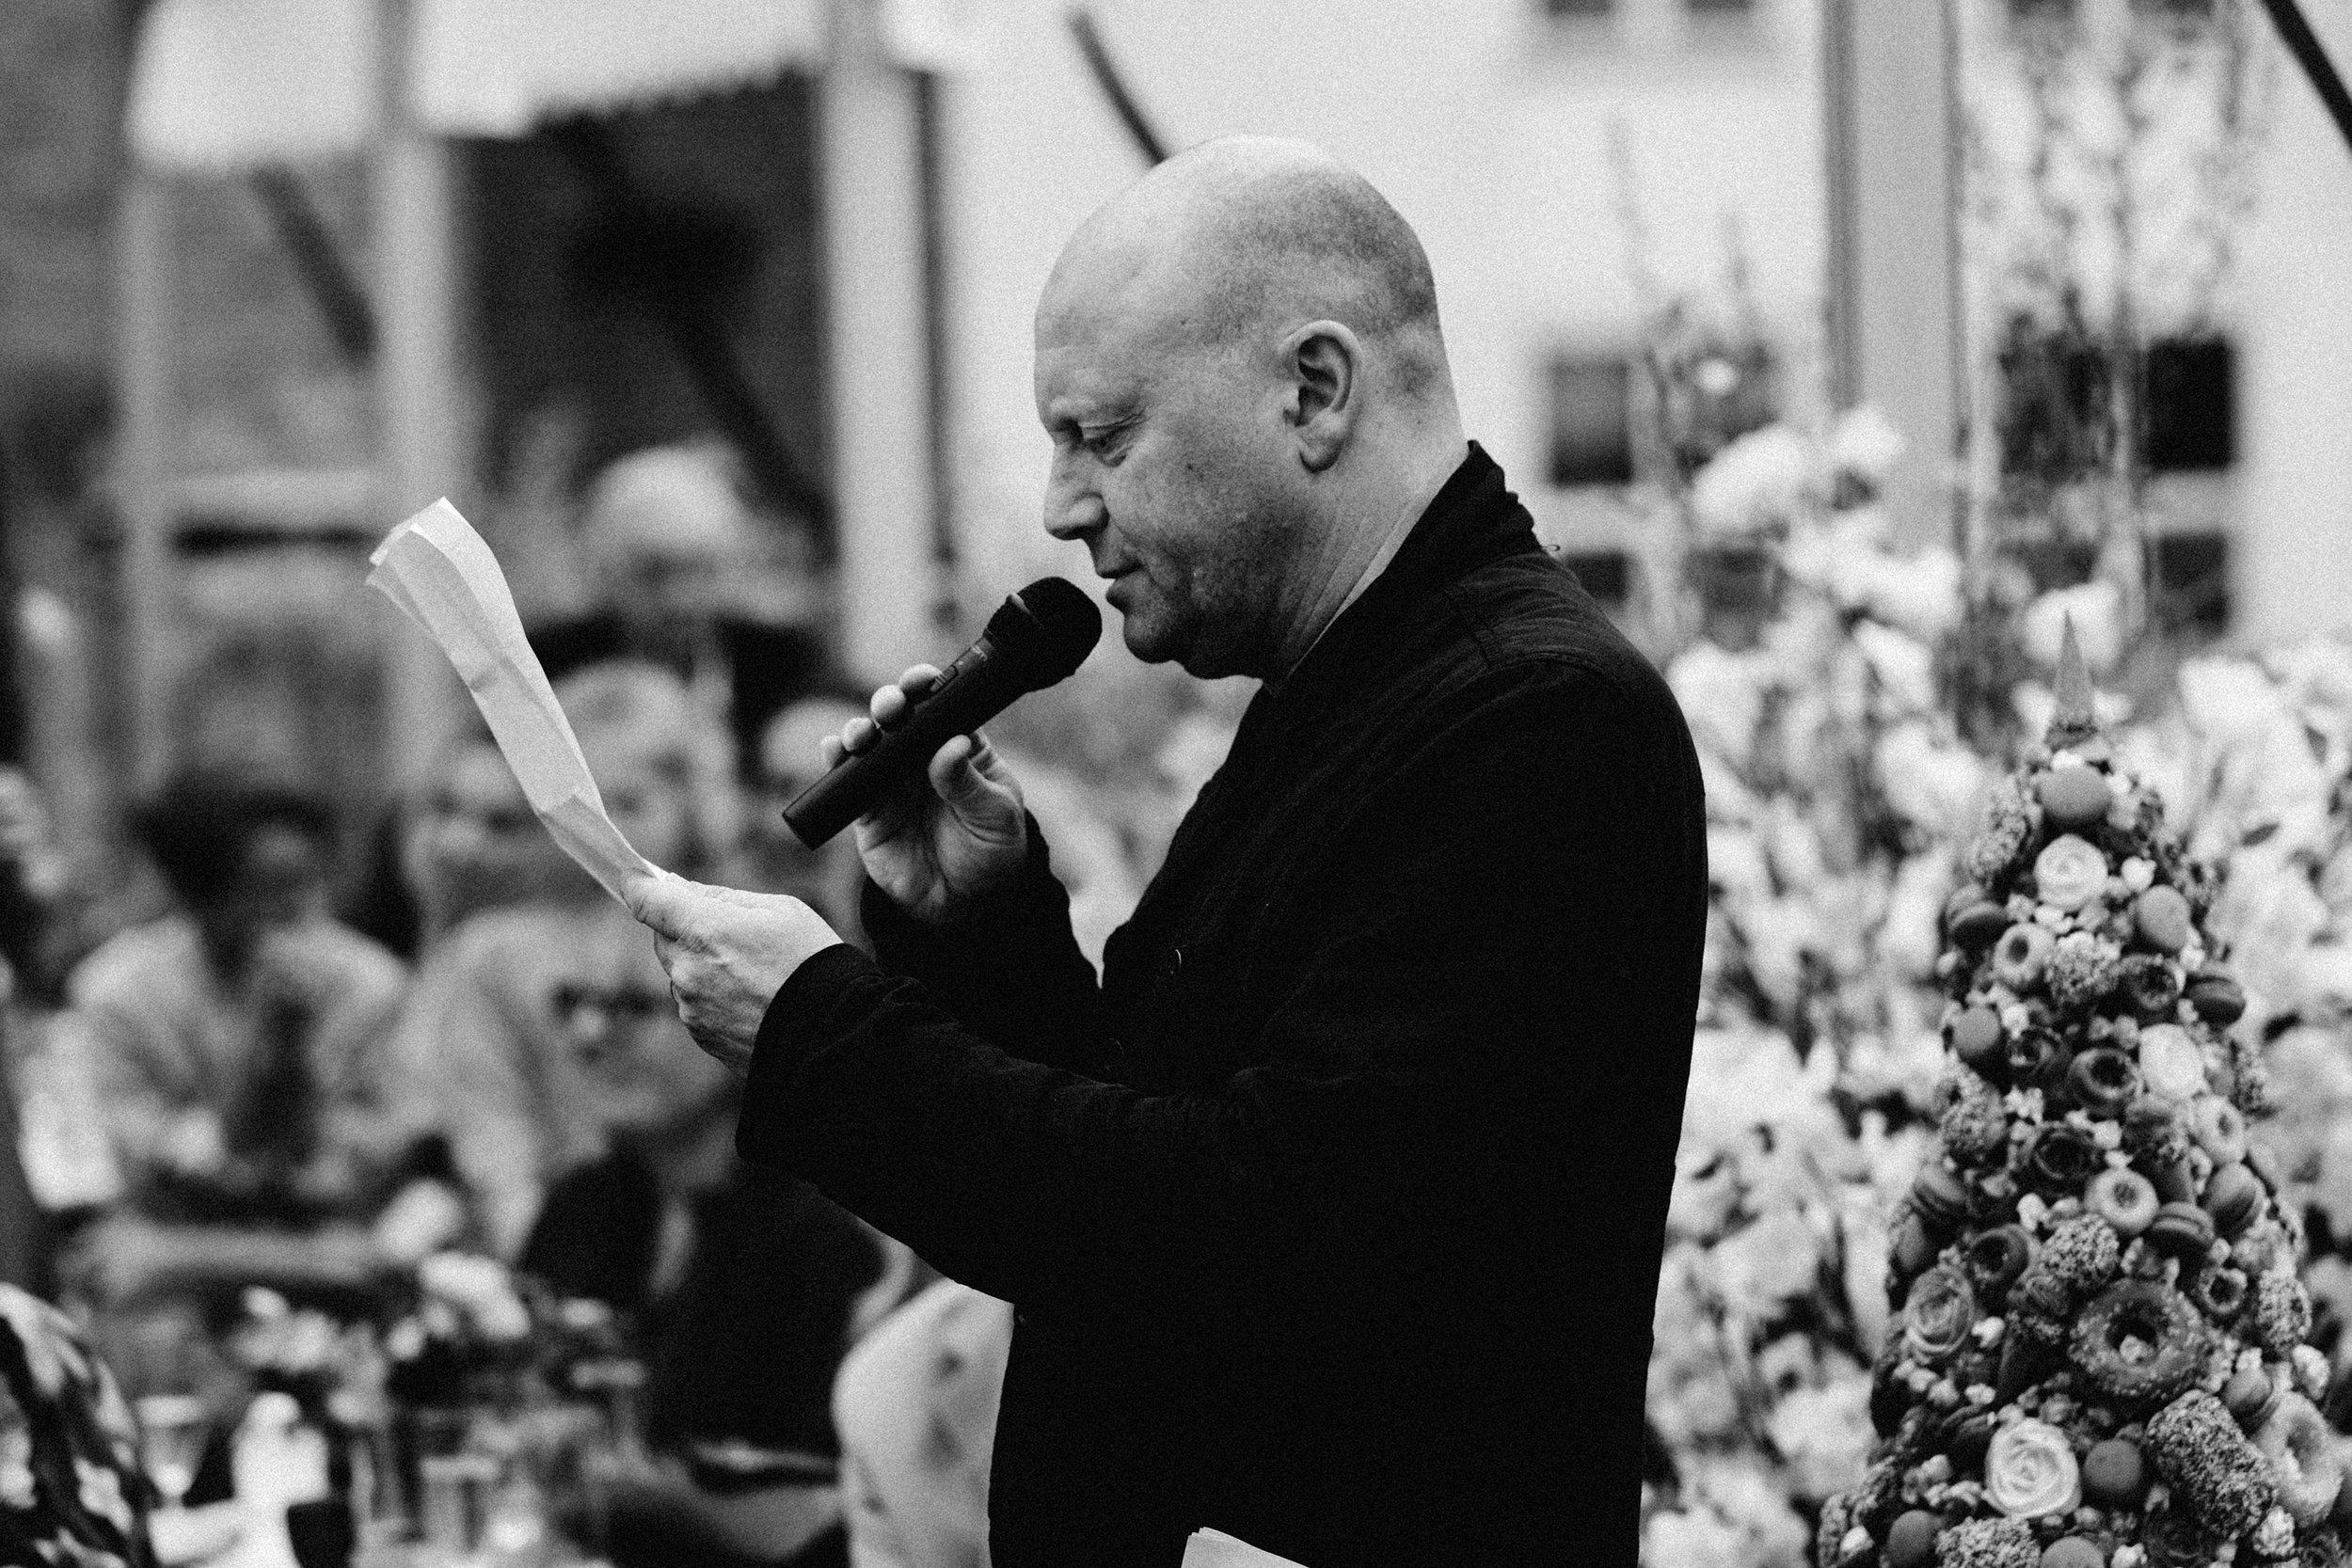 West-London-wedding-party-in-Ladbroke-Grove-Michael-Newington-Gray-46.jpg